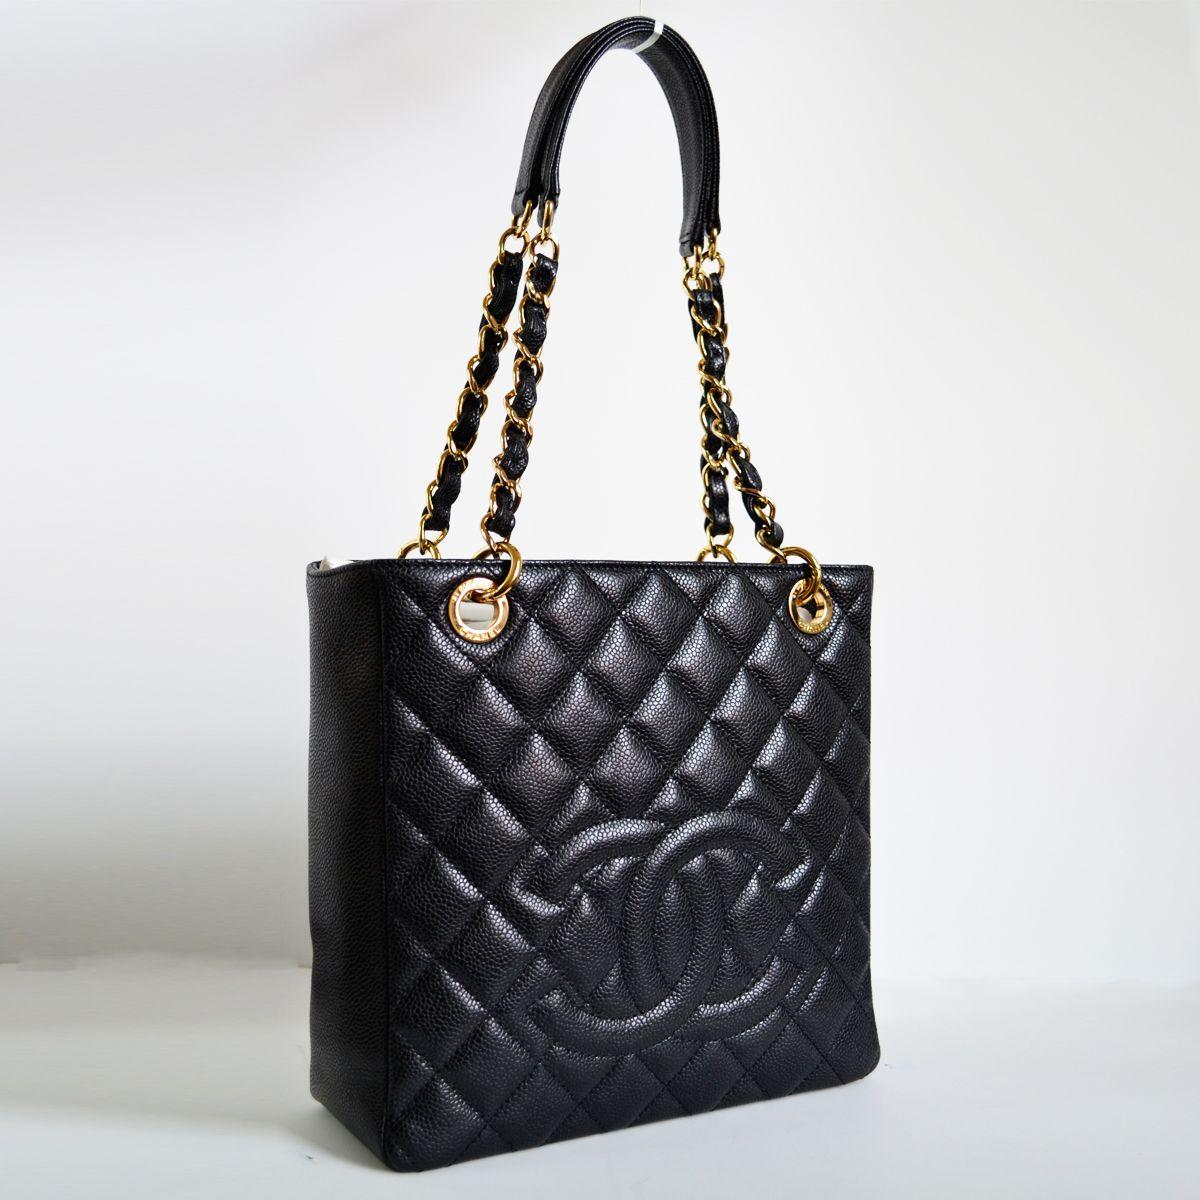 fccb7184c94 Chanel Black Caviar Petite Timeless Tote PTT Bag | My Closet ...